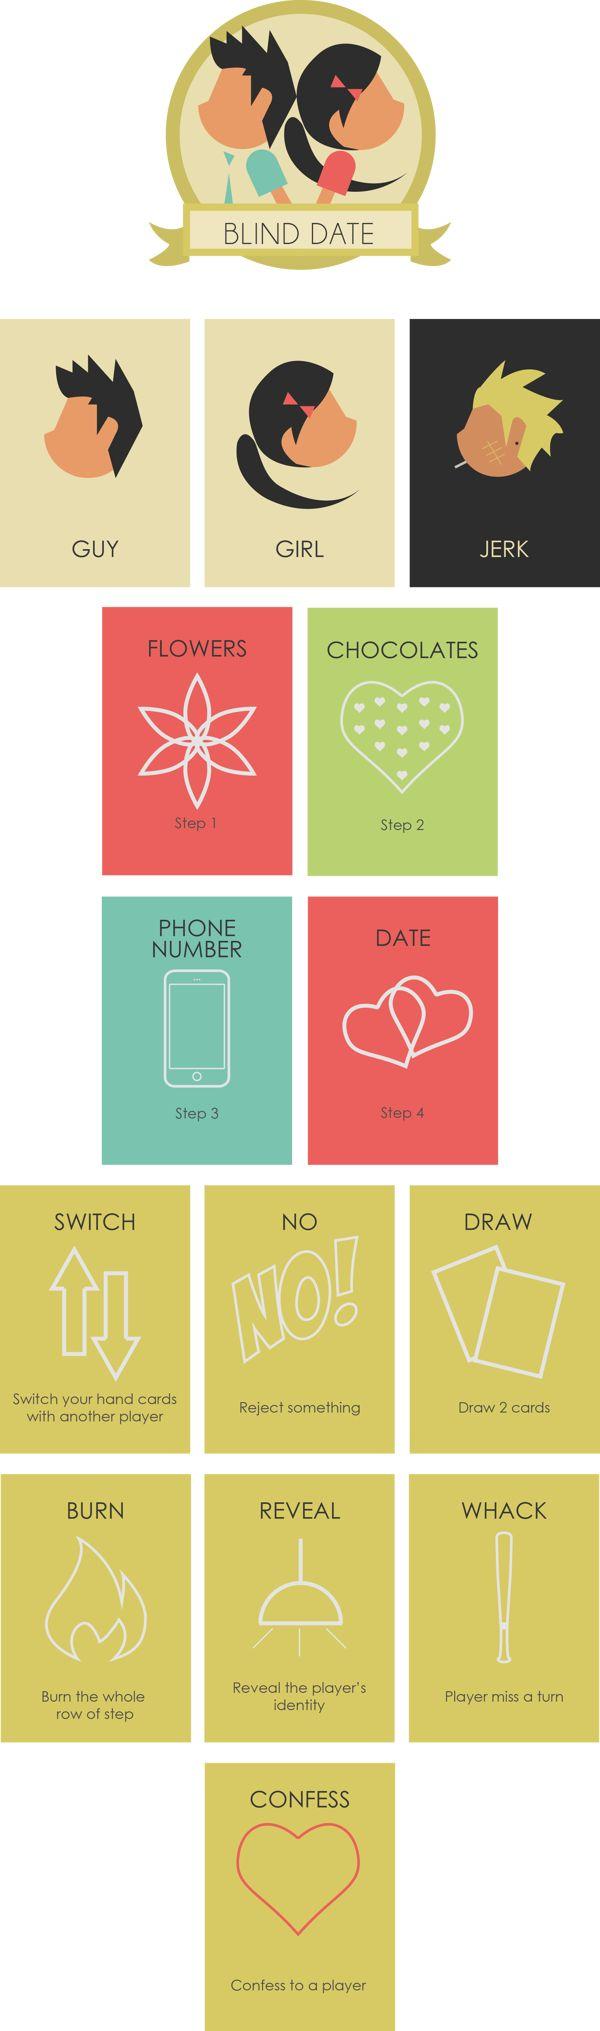 Blind Date (Card Game Design)